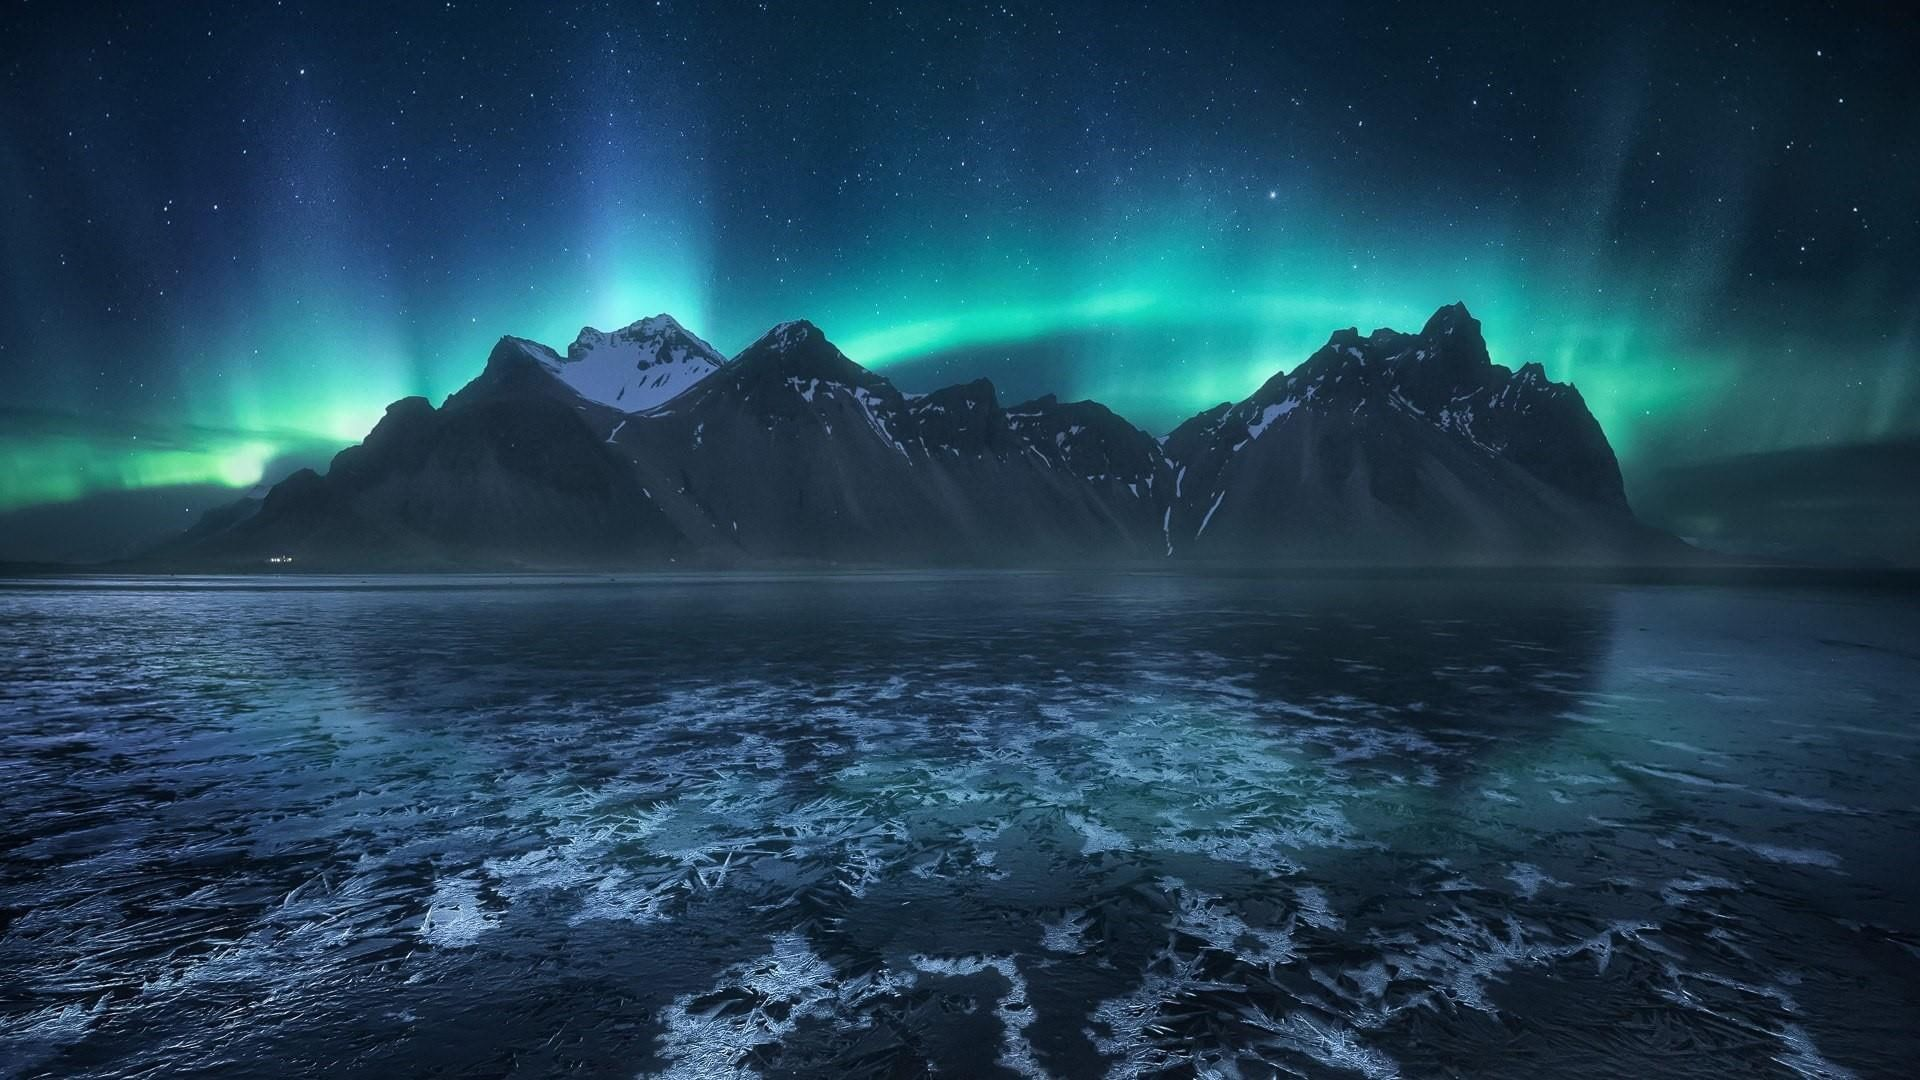 Nature Atmosphere Sky Aurora Borealis Phenomenon Arctic Iceland Water Vestrahorn Peaks Brunnhorn In 2020 Landscape Photography Northern Lights Aurora Boreal